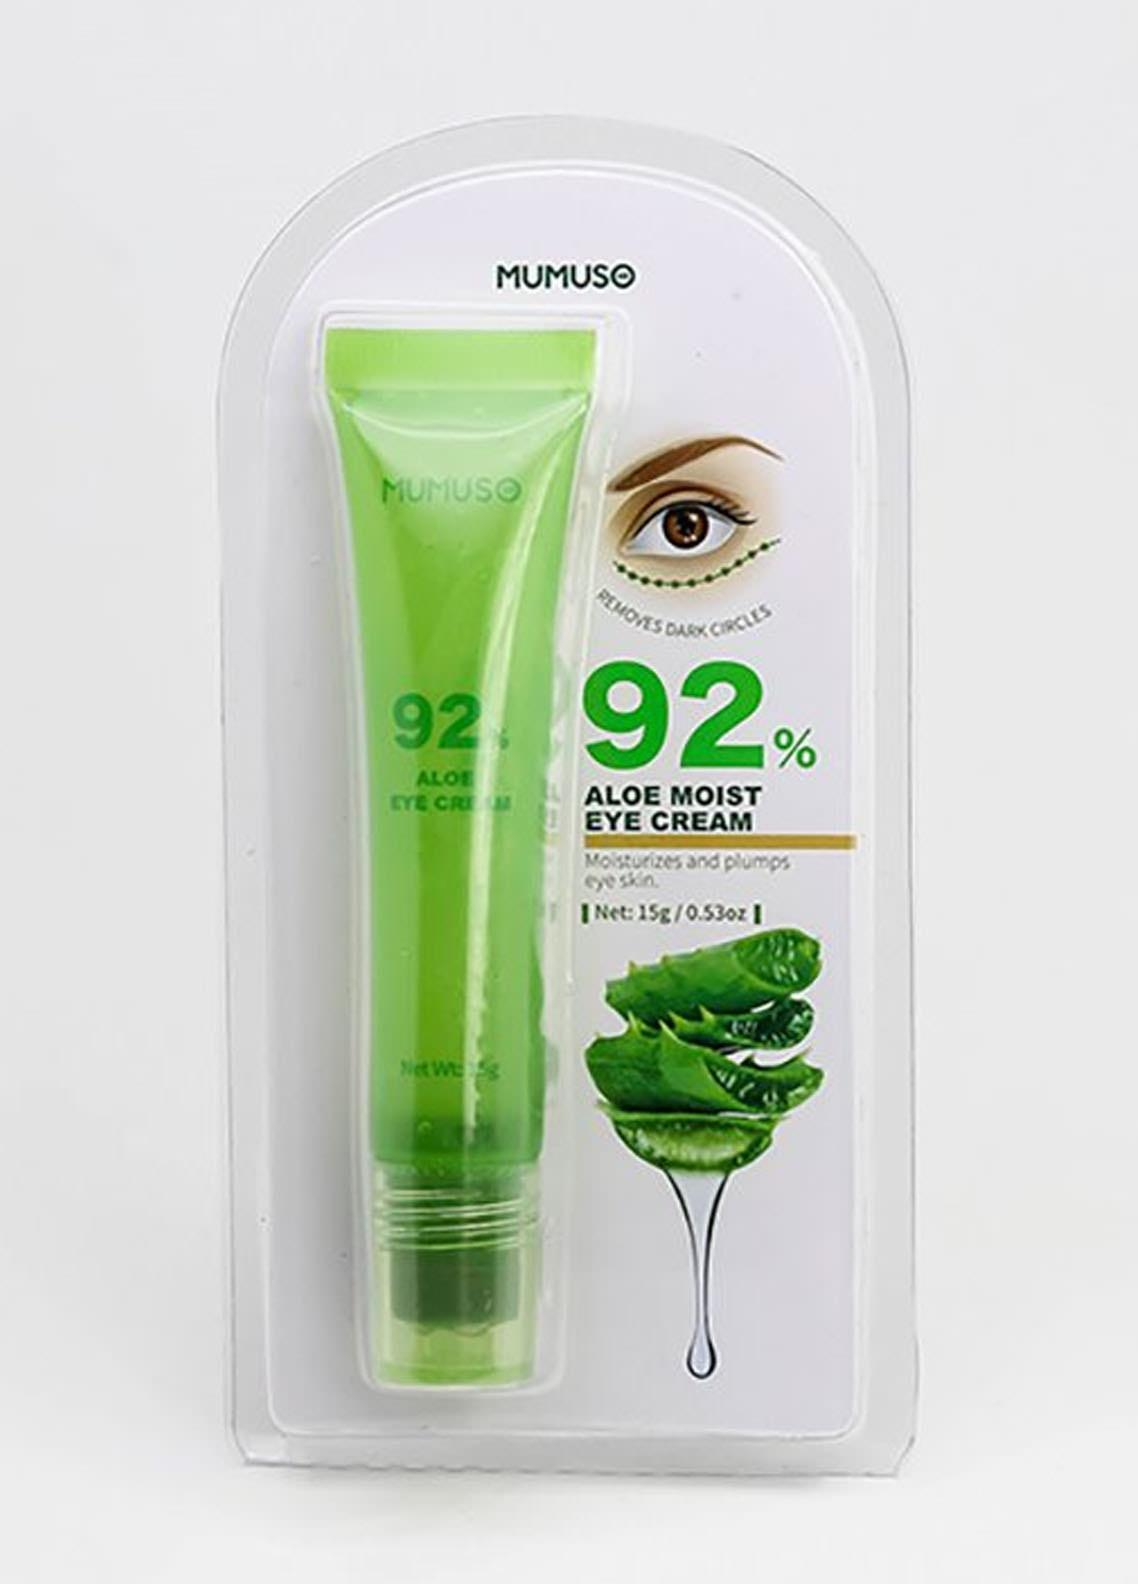 Mumuso Aloe Eye Cream